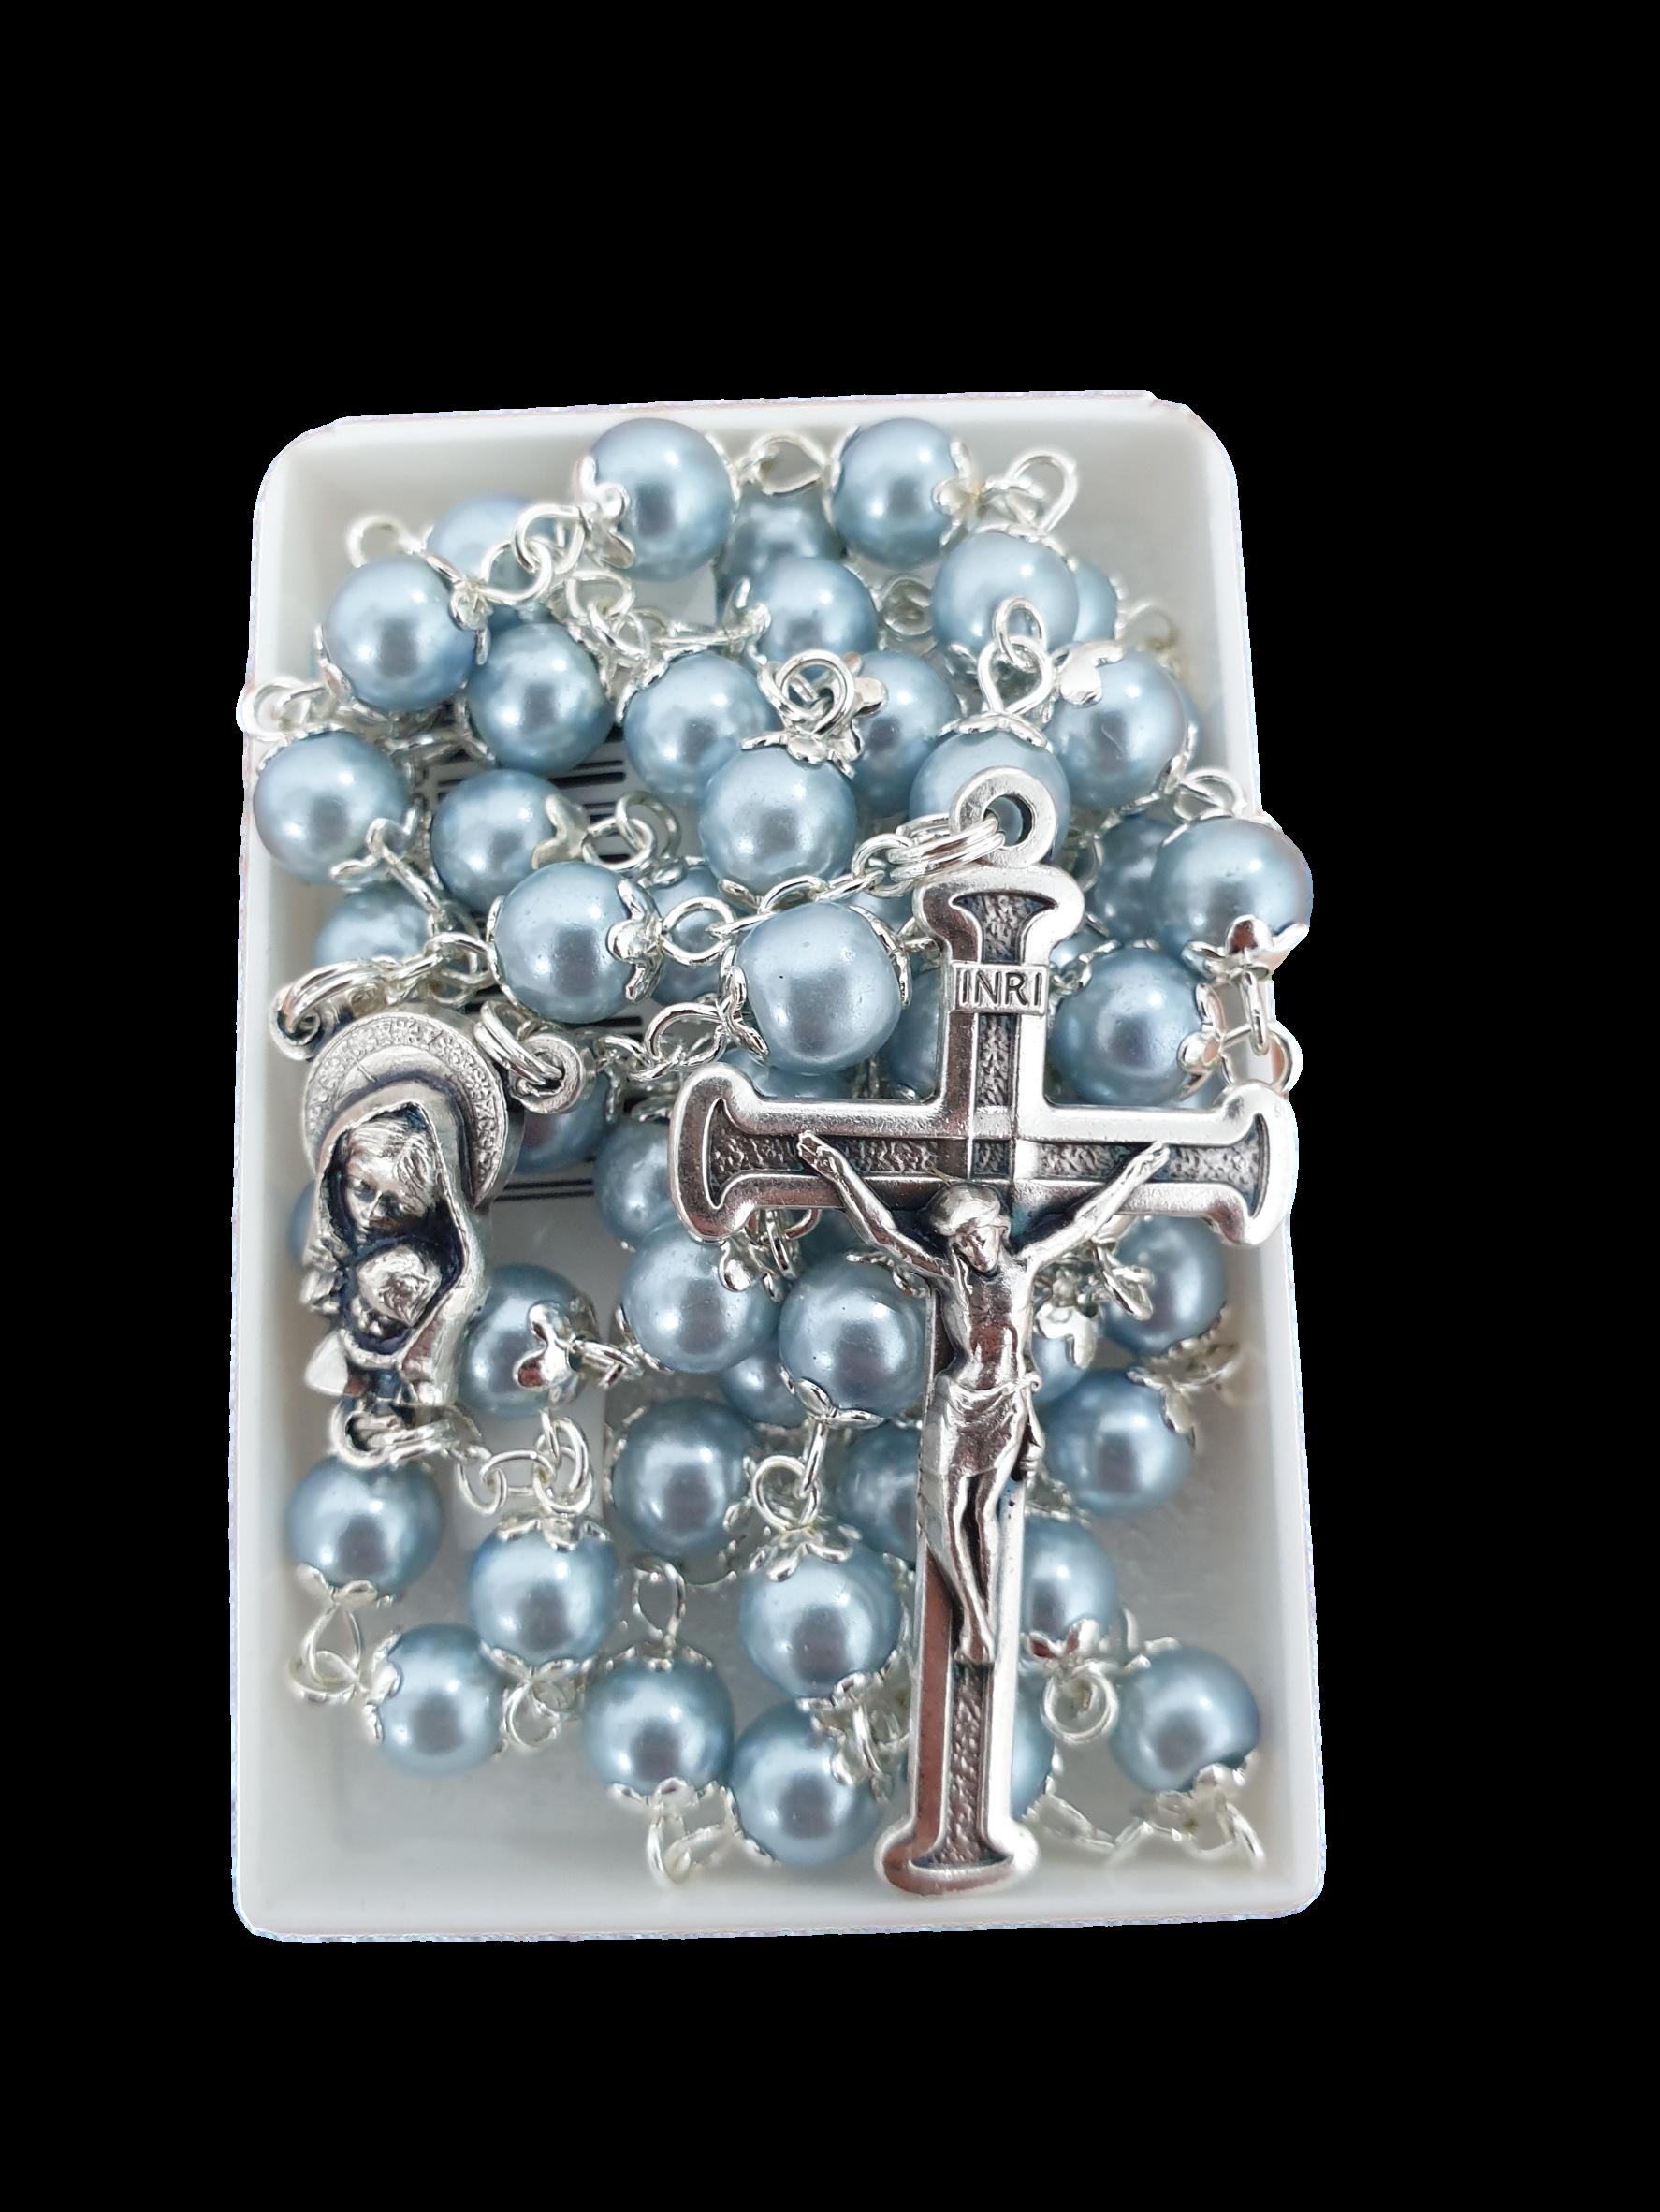 Roman Inc Rosary Beads - Pearl Blue